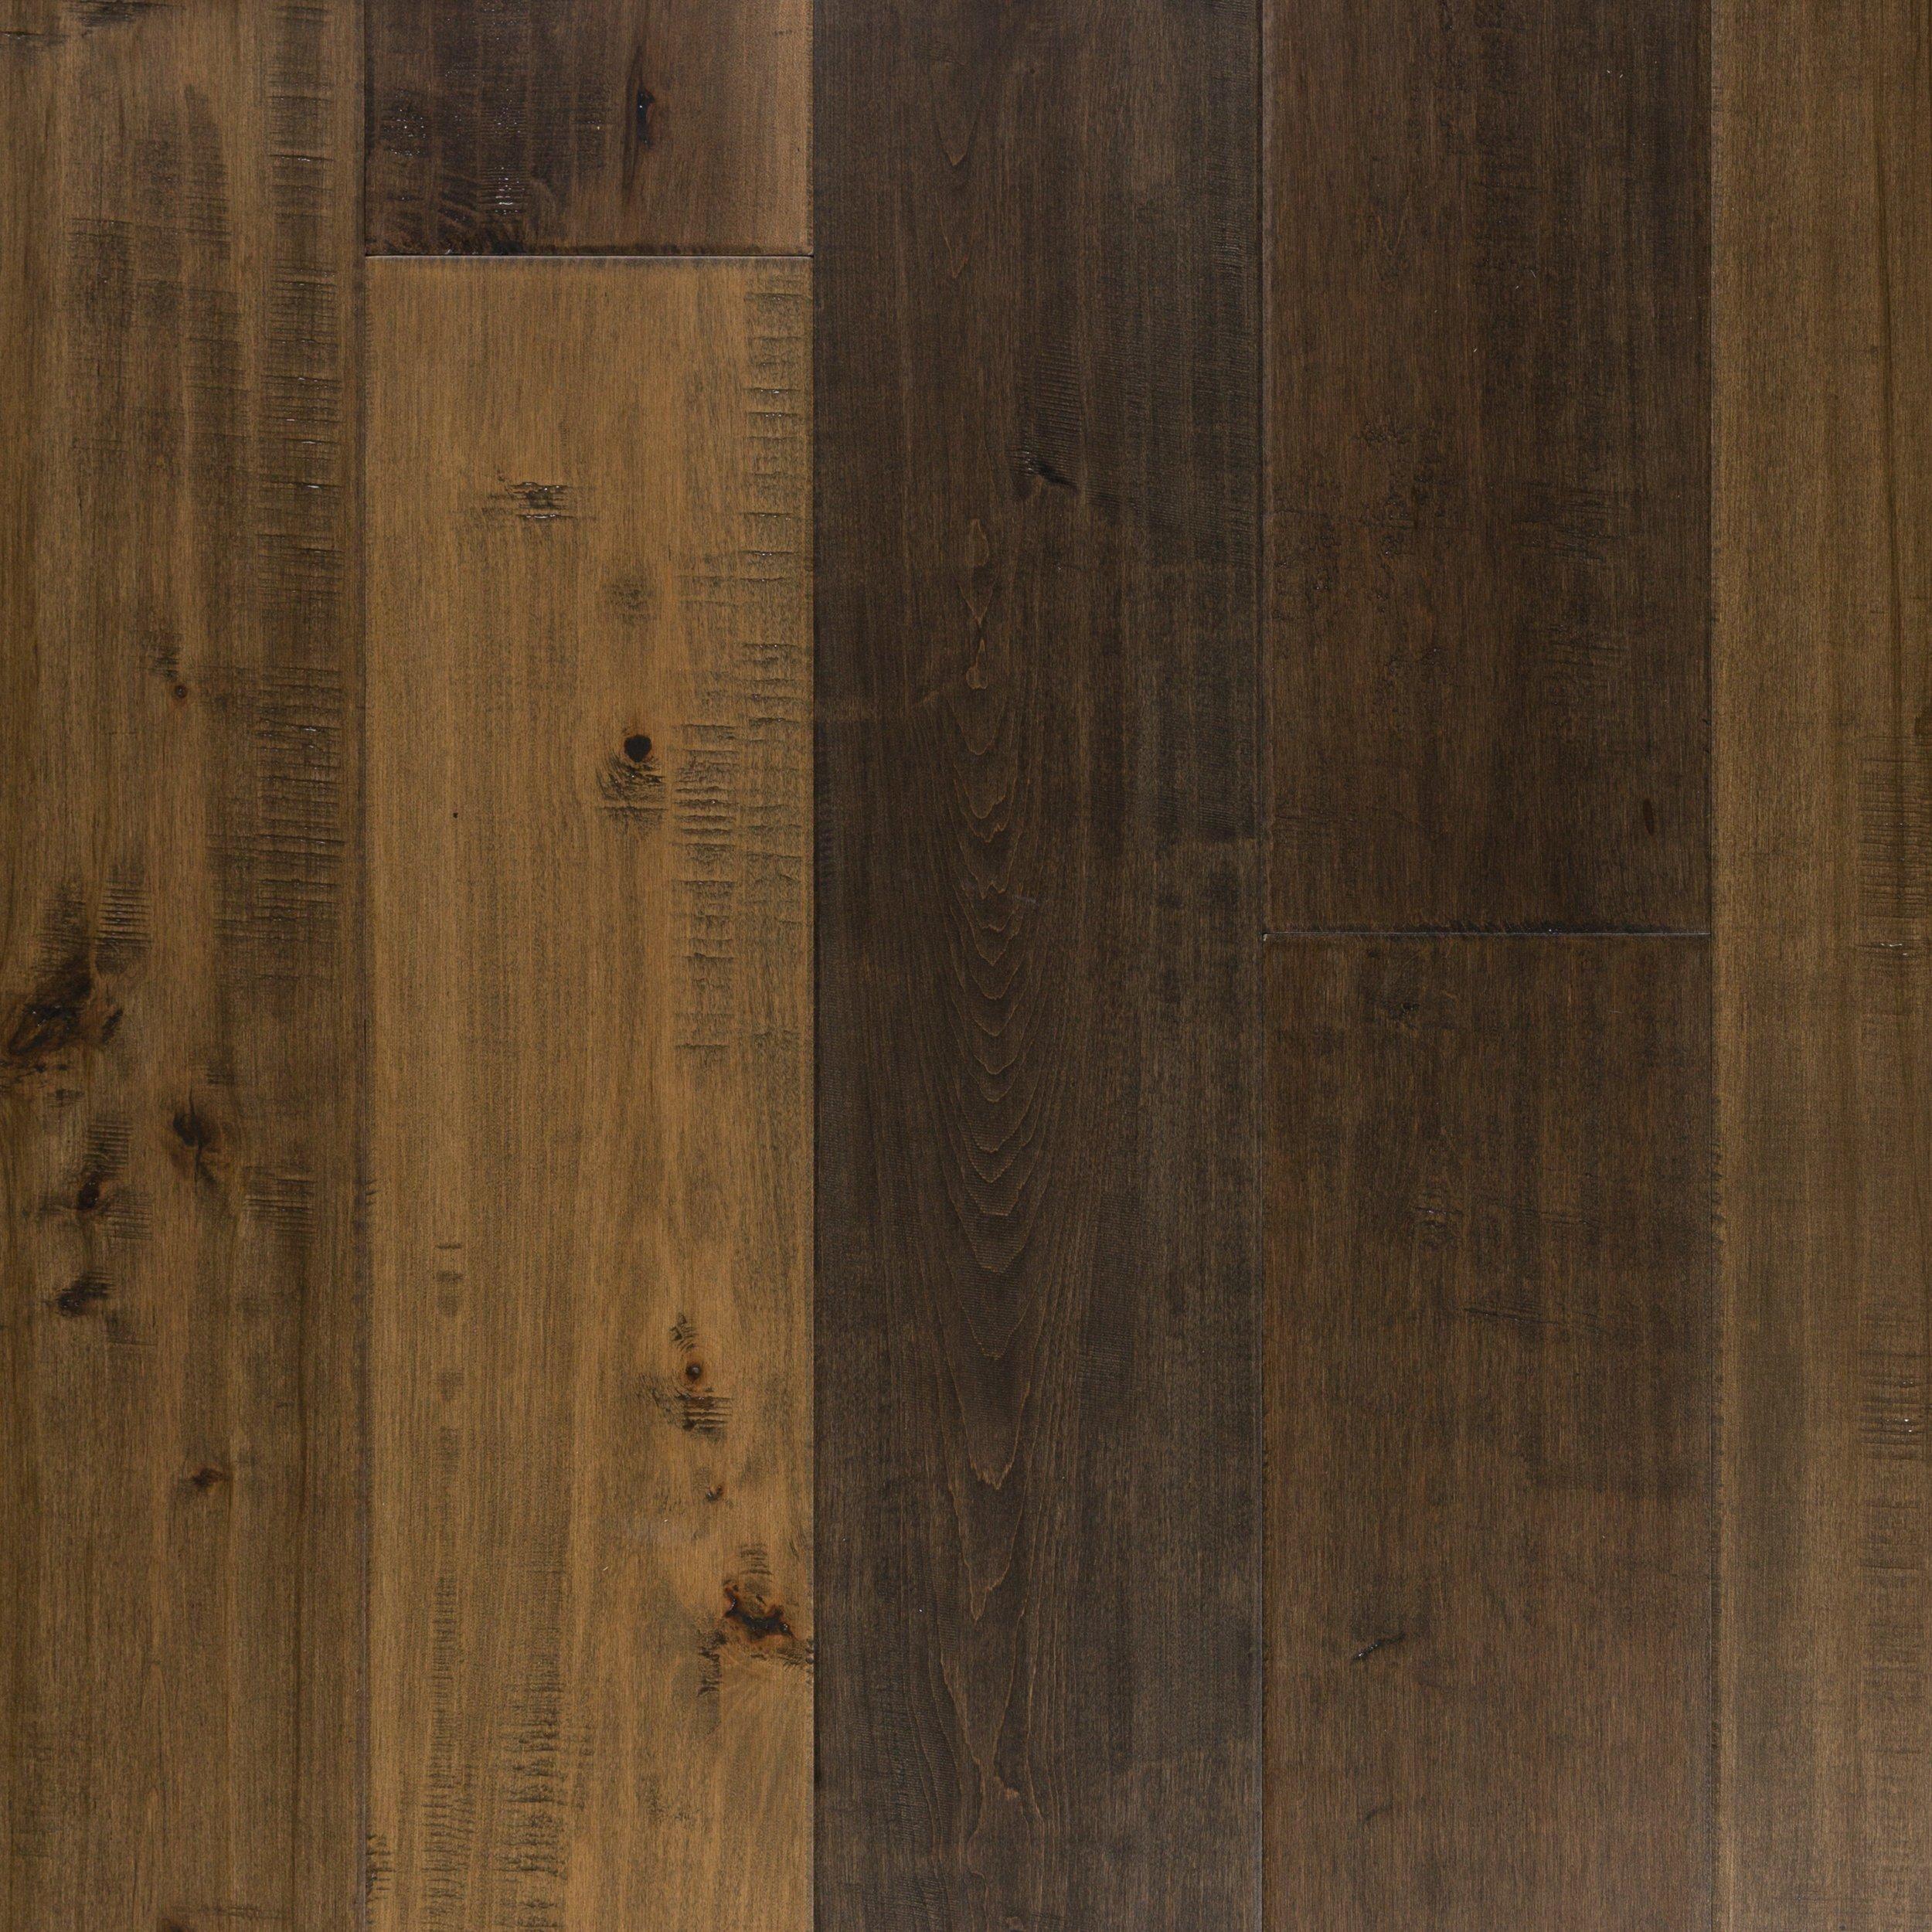 Valerian Bronze Maple Engineered Hardwood In 2020 Wood Floors Wide Plank Hardwood Floors Hardwood